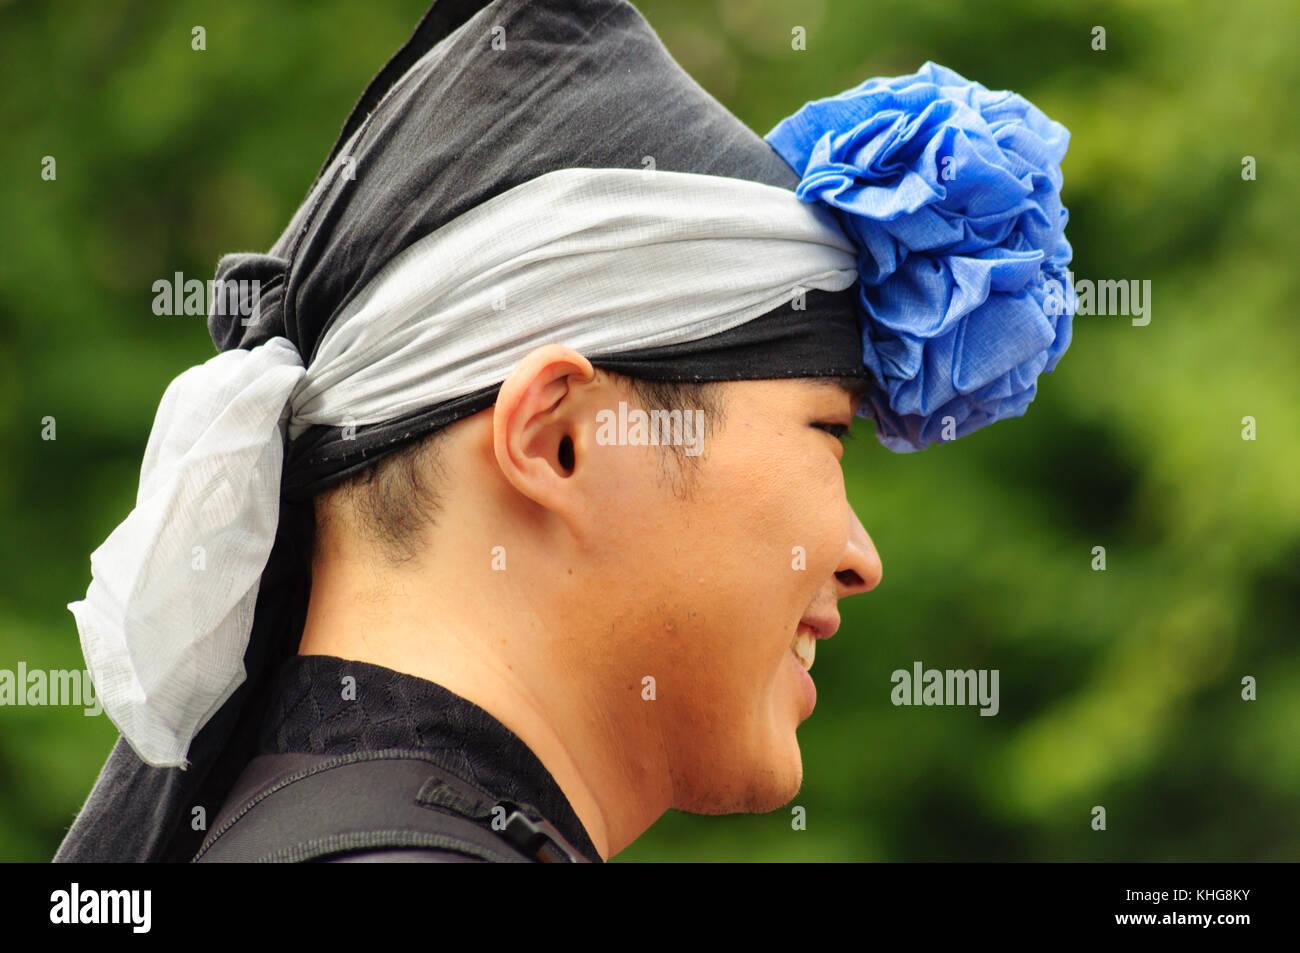 Male performer wearing a headdress on the Royal Mile during the Edinburgh International Fringe Festival - Stock Image